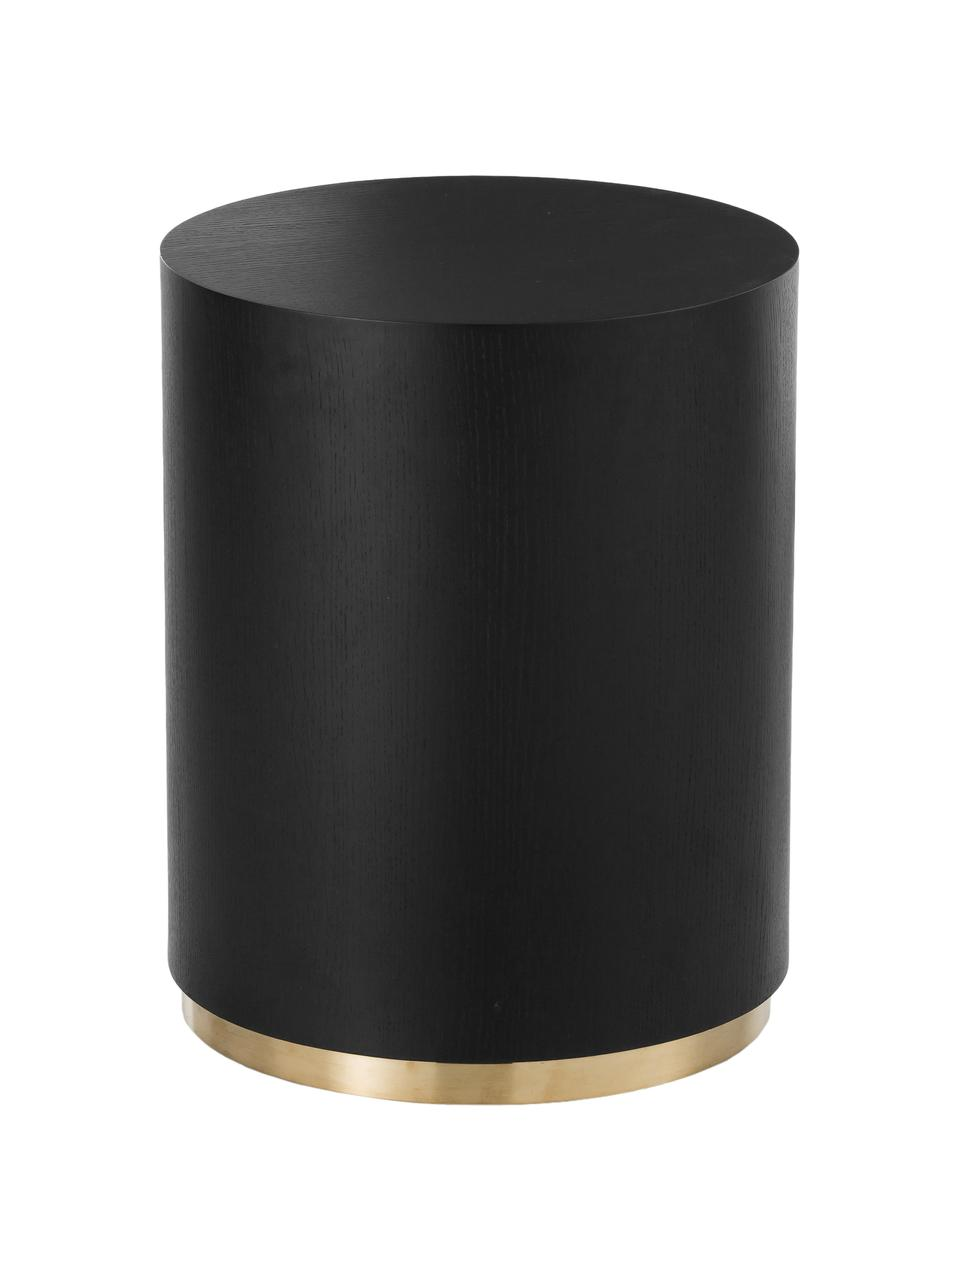 Tavolino rotondo nero Clarice, Nero, Ø 40 x Alt. 50 cm